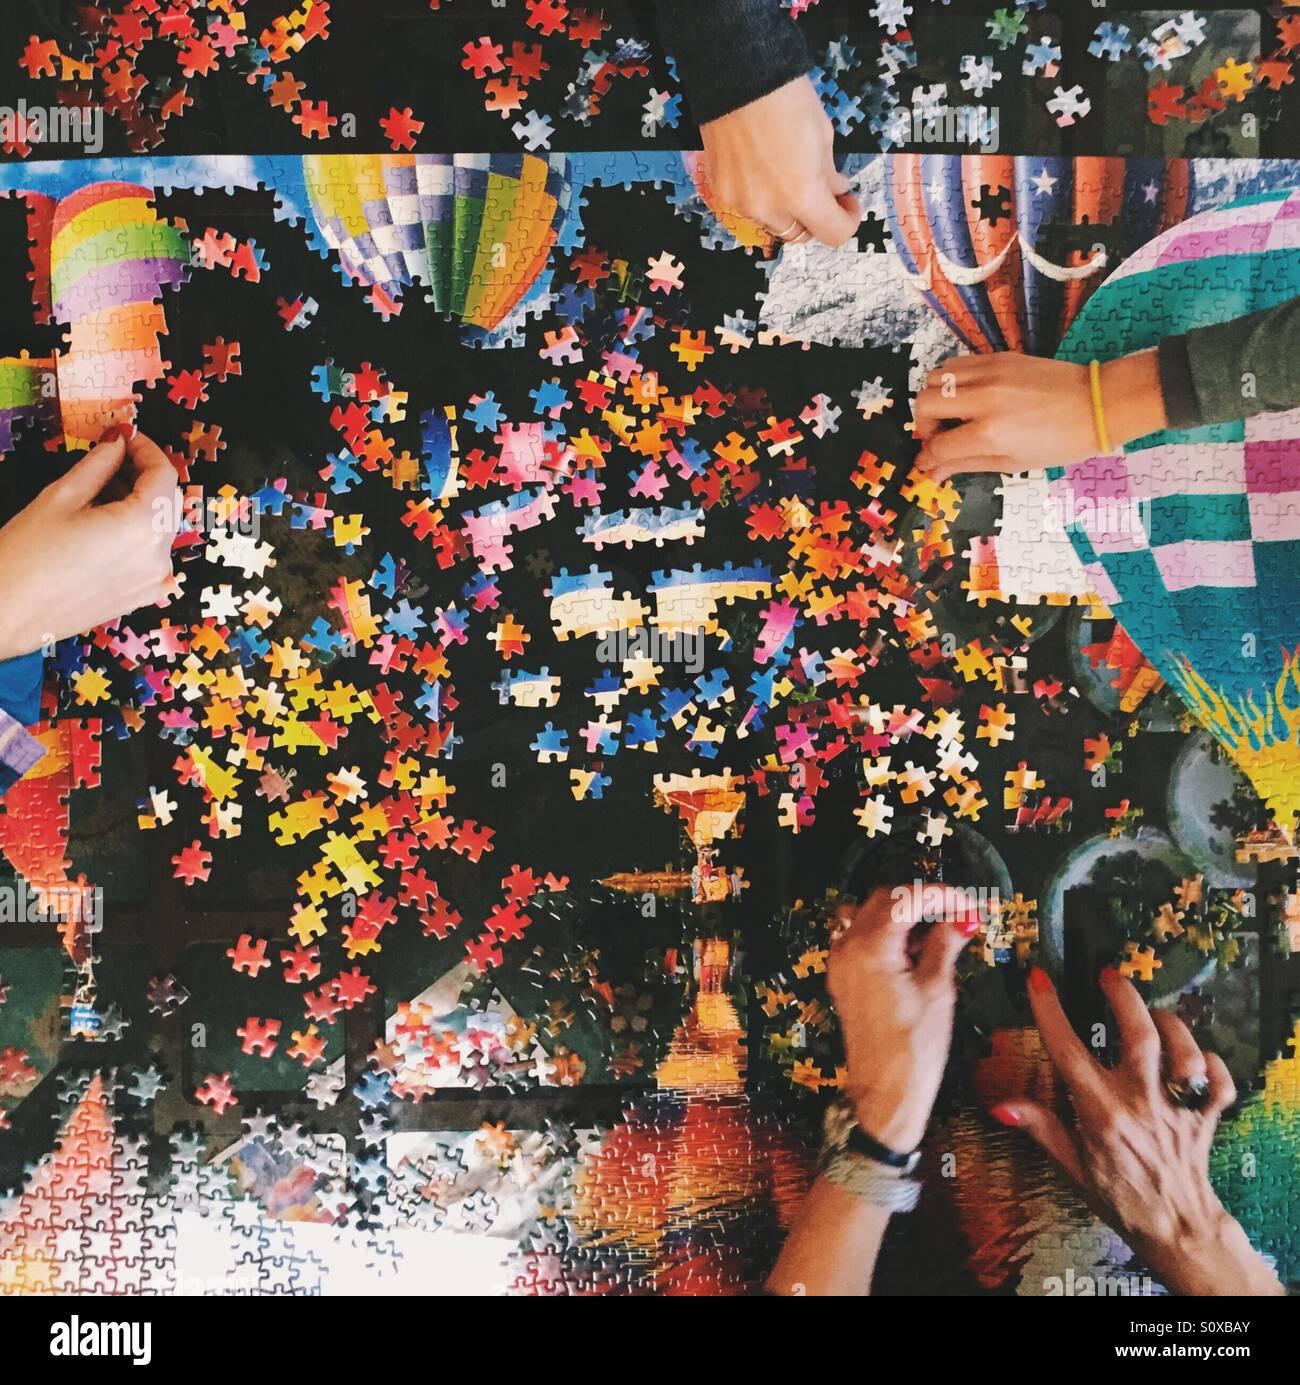 Jigsaw Puzzle - Stock Image